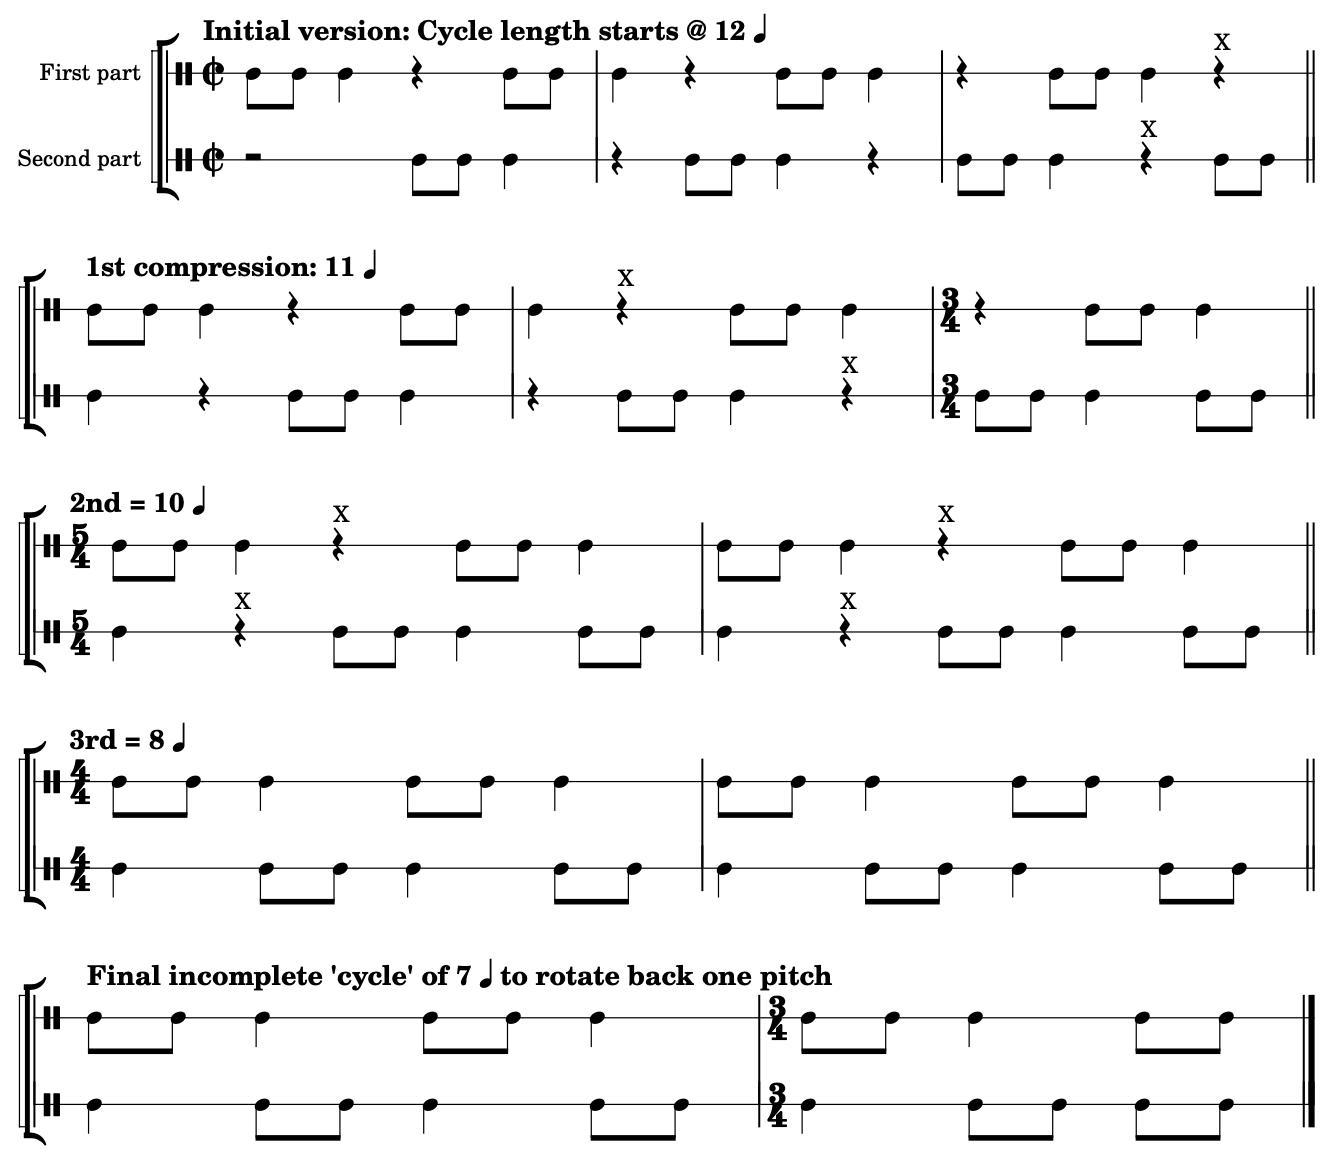 Rhythmic cycles with progressive compression